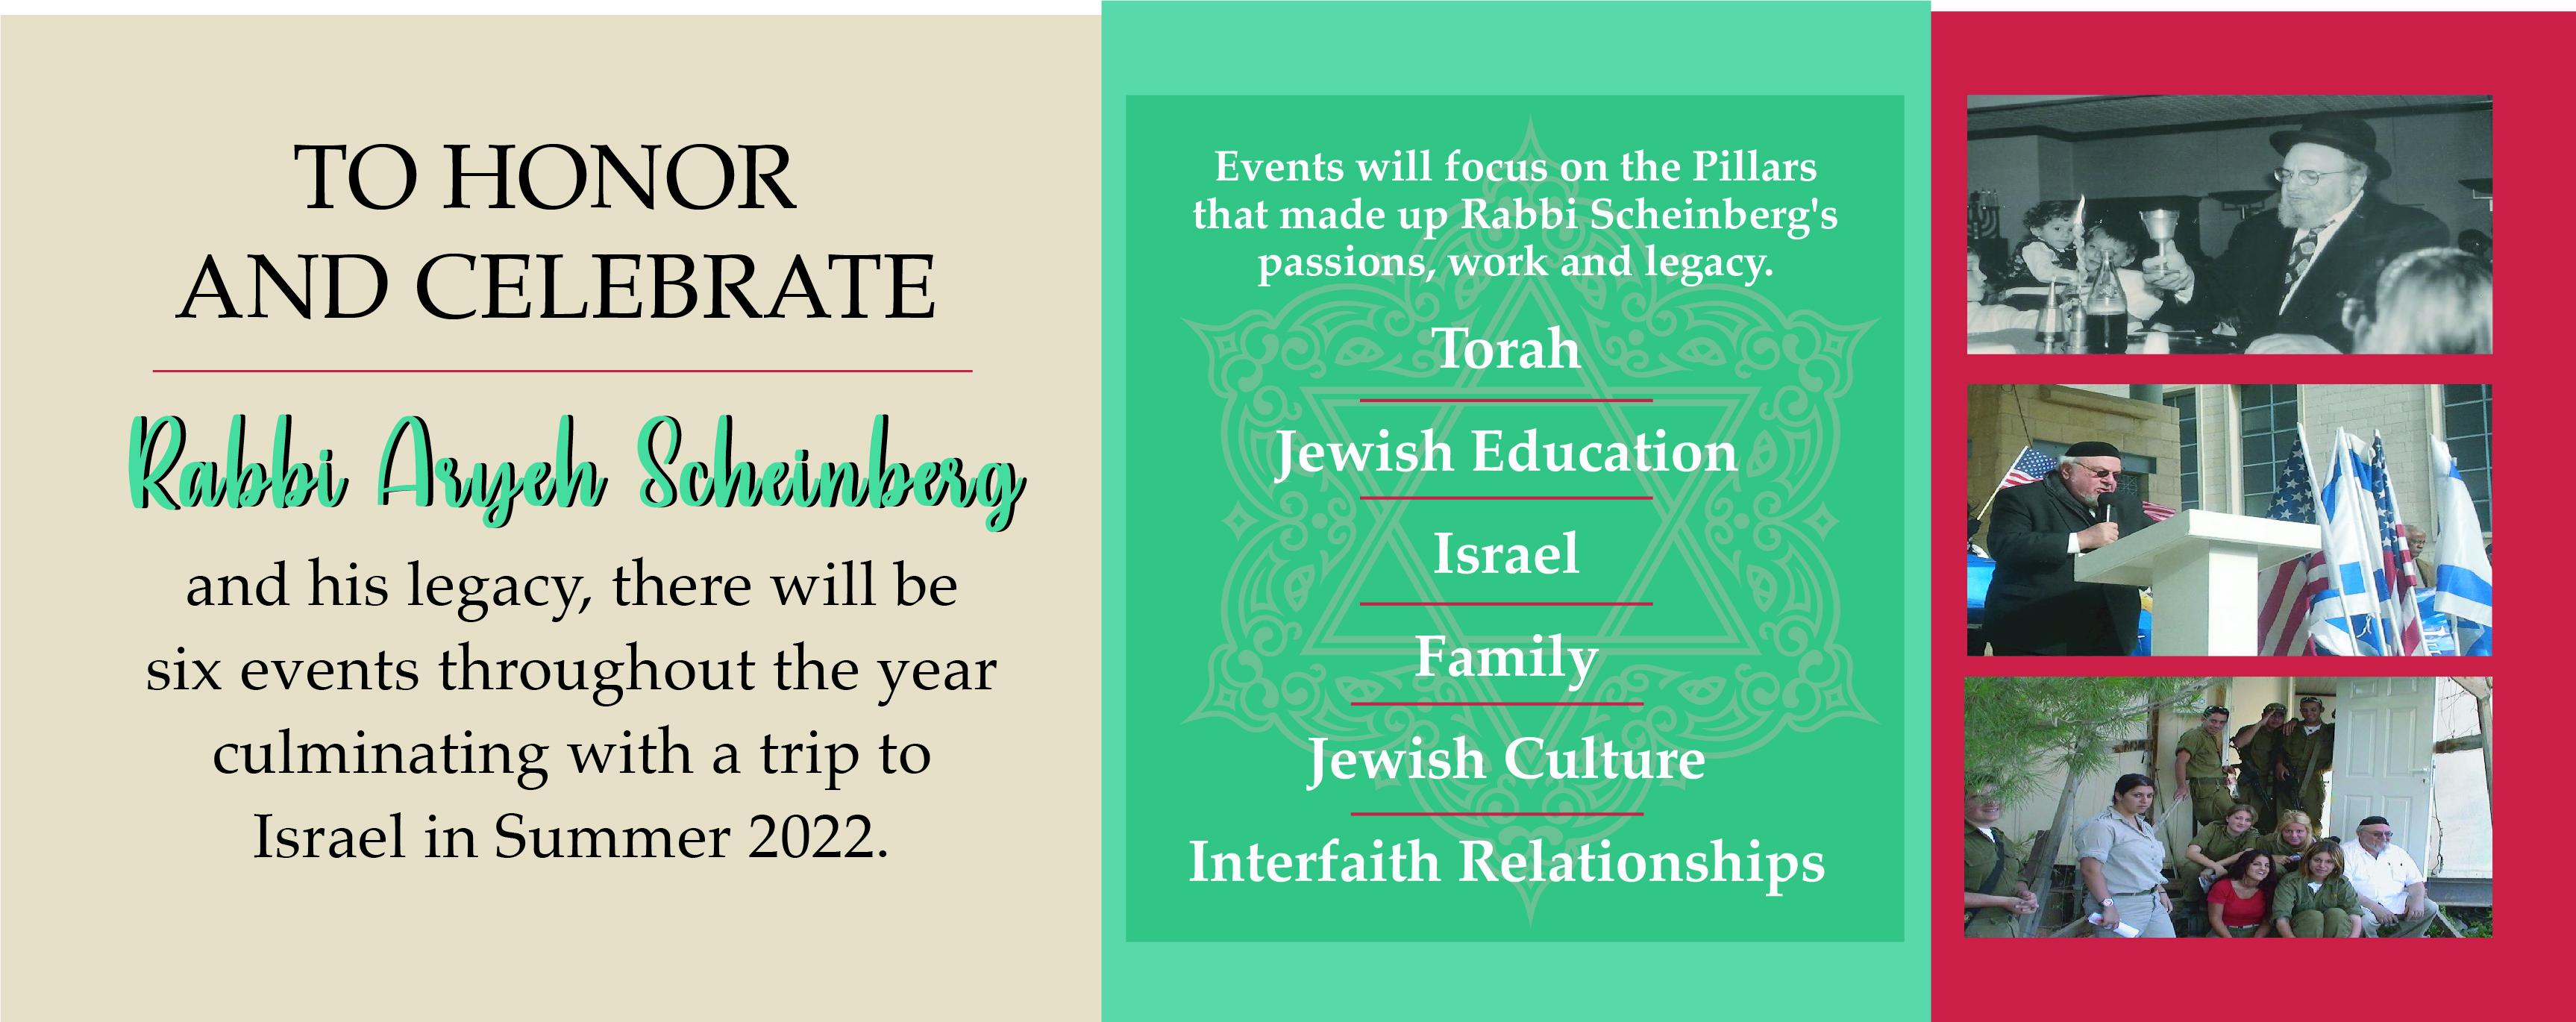 "</a>                                                                                                                                                                                      <a href=""https://www.rodfeisholom.com/event/rabbi-aryeh-and-judy-scheinberg-endowment-fund.html"" class=""slider_link""                             target="""">                             Honor Rabbi Scheinberg Here                            </a>"